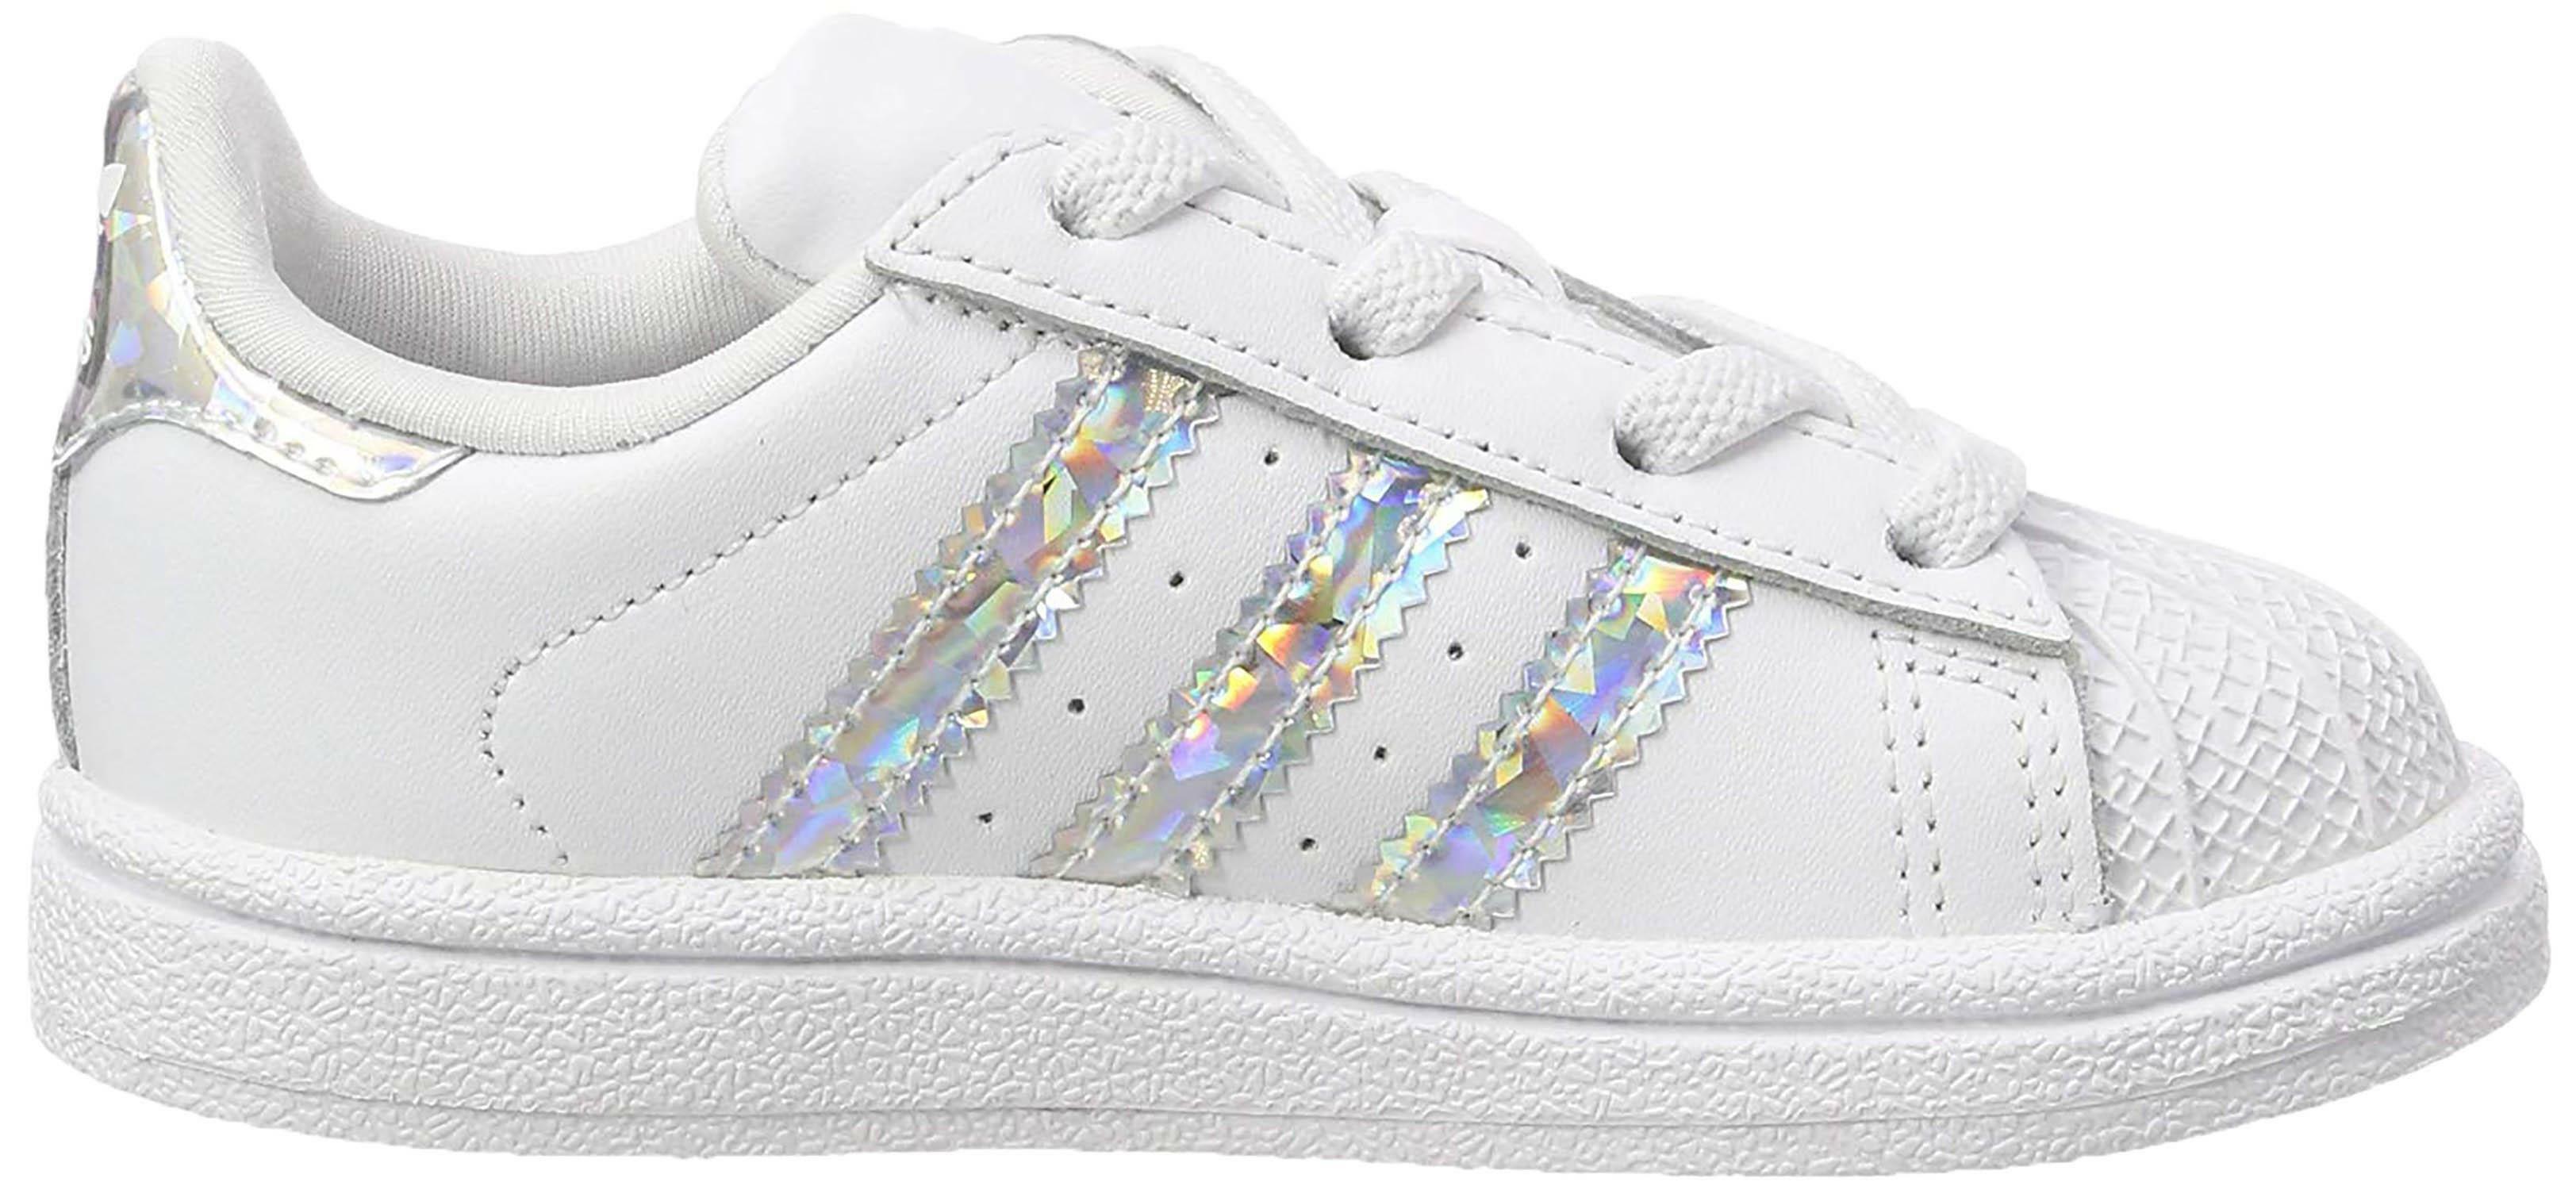 Adidas superstar el i scarpe sportive bambina bianche cg6707